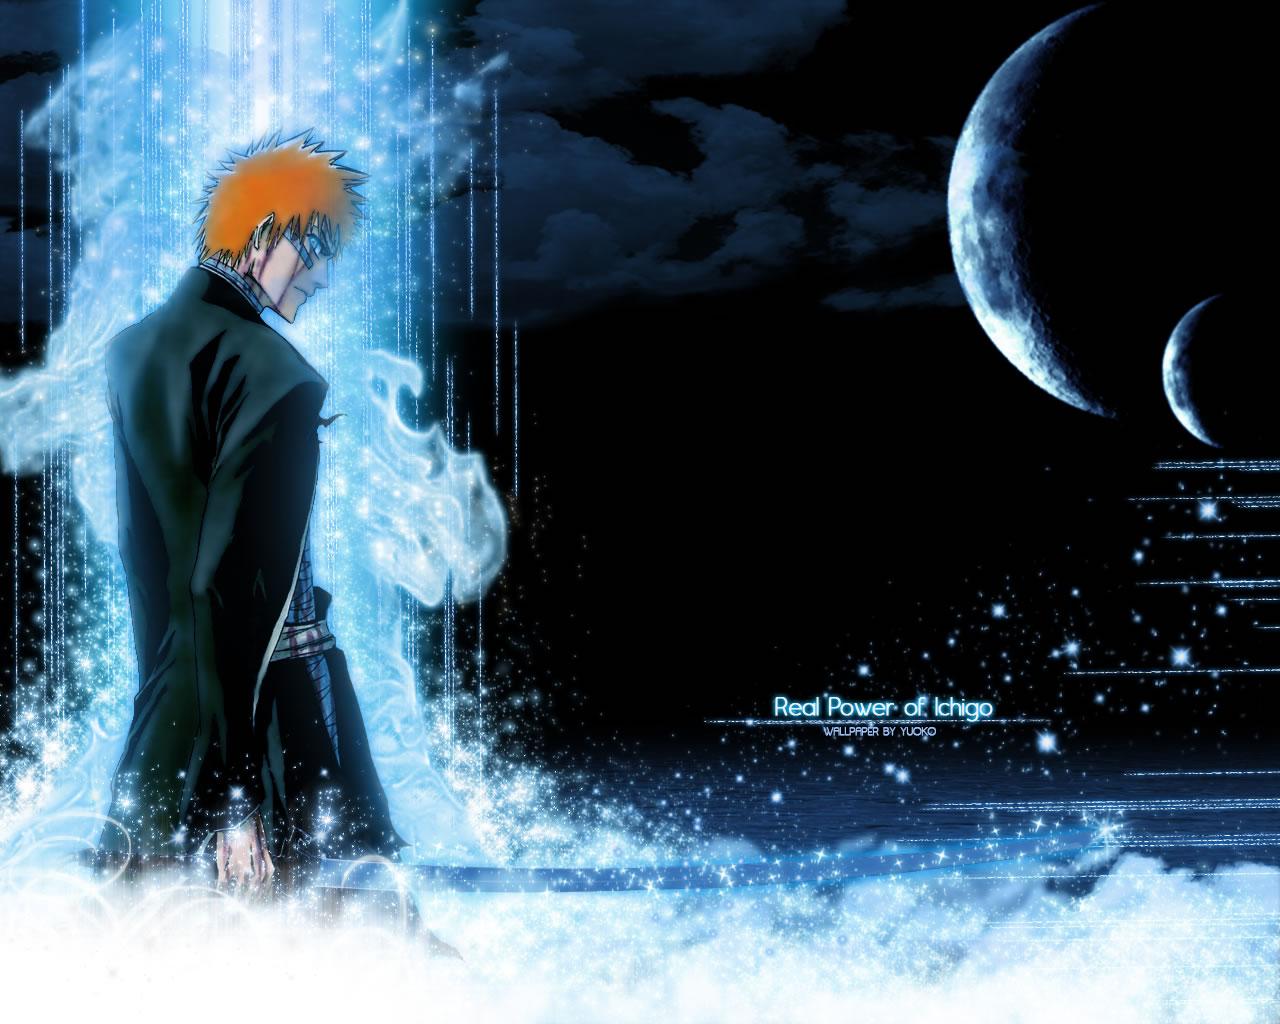 Blue Kurosaki Ichigo Bankai Bleach Anime Wallpaper